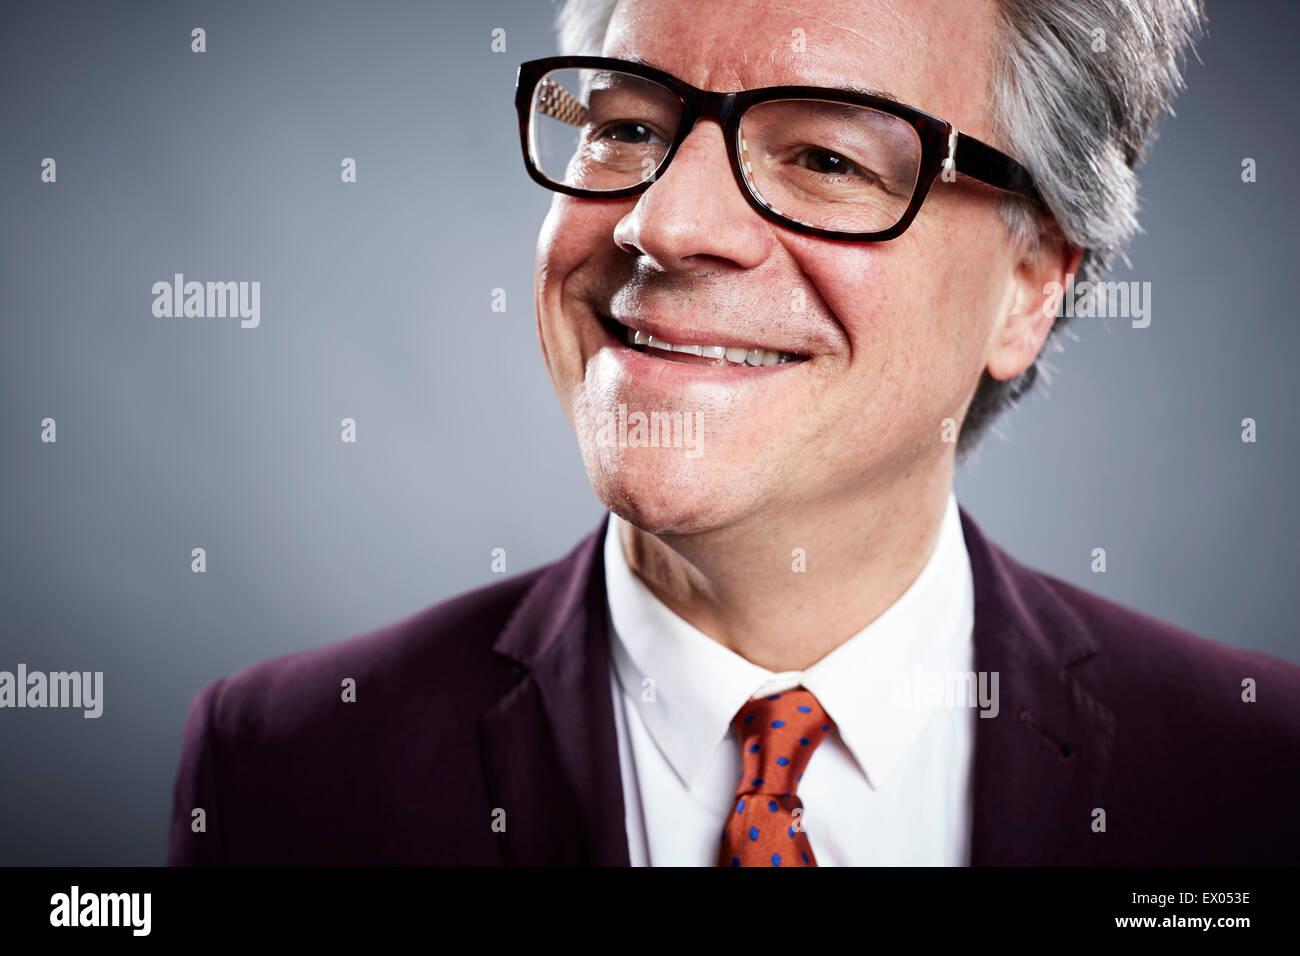 Close up studio portrait of smiling mature businessman - Stock Image